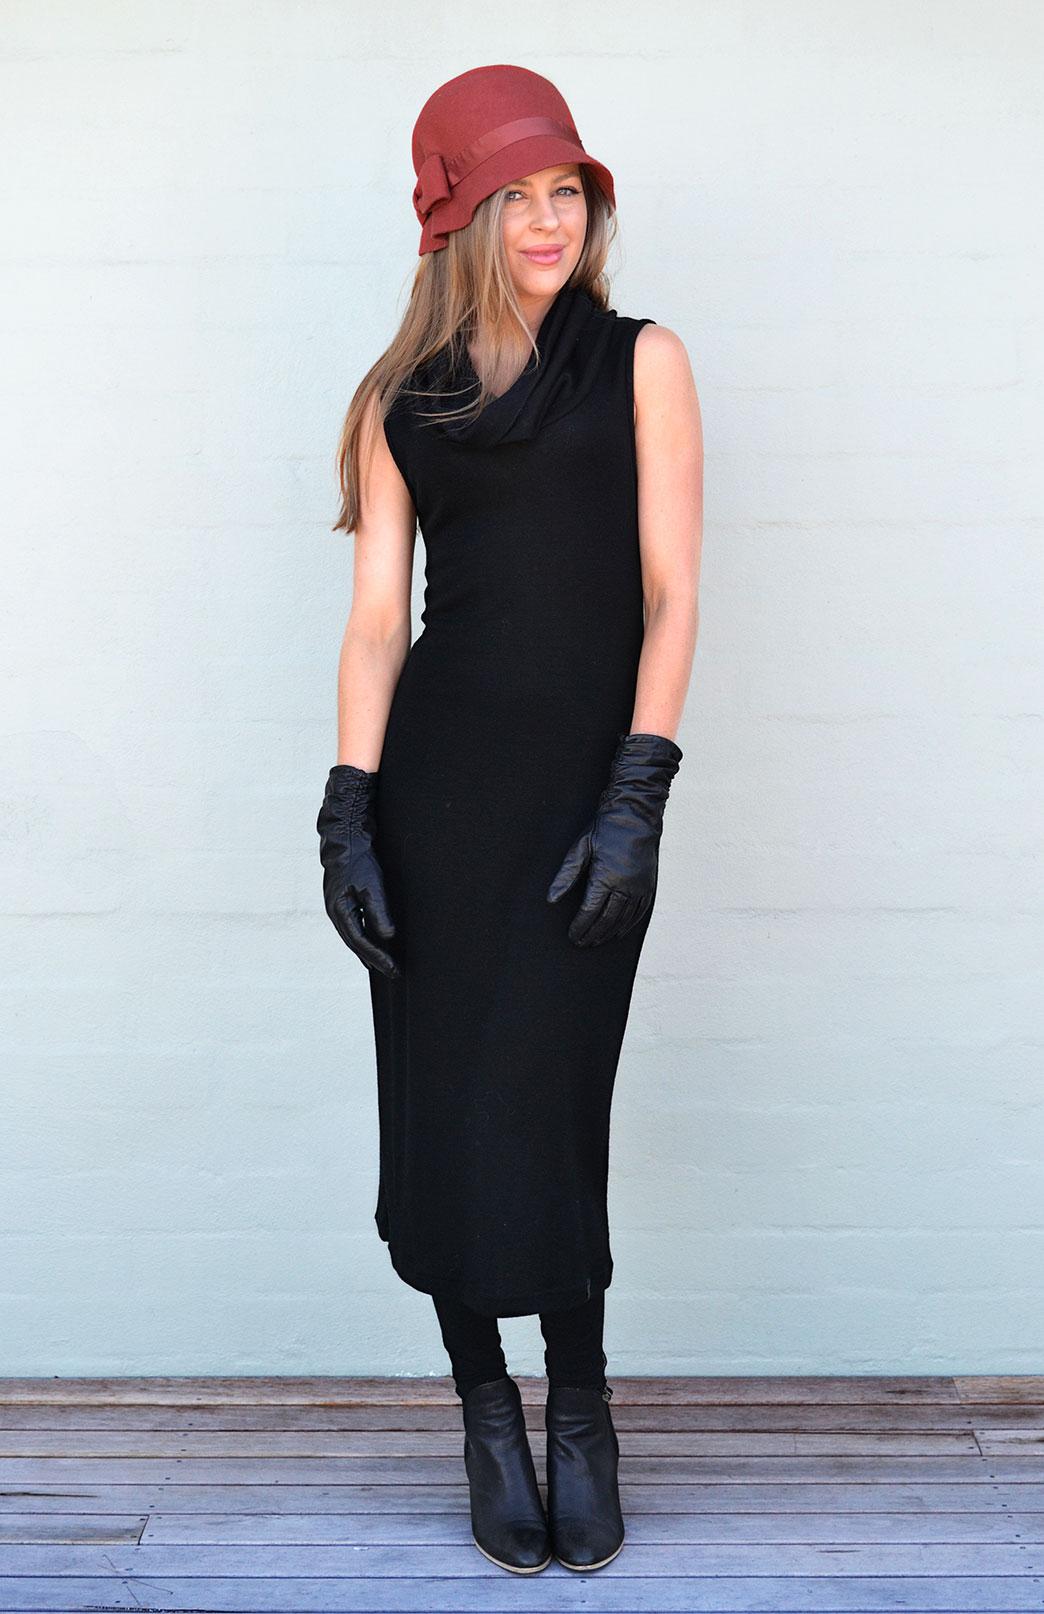 Cowl Neck Midi Dress - Women's Black Sleeveless Heavyweight Merino Cowl Neck Midi Dress for Winter - Smitten Merino Tasmania Australia